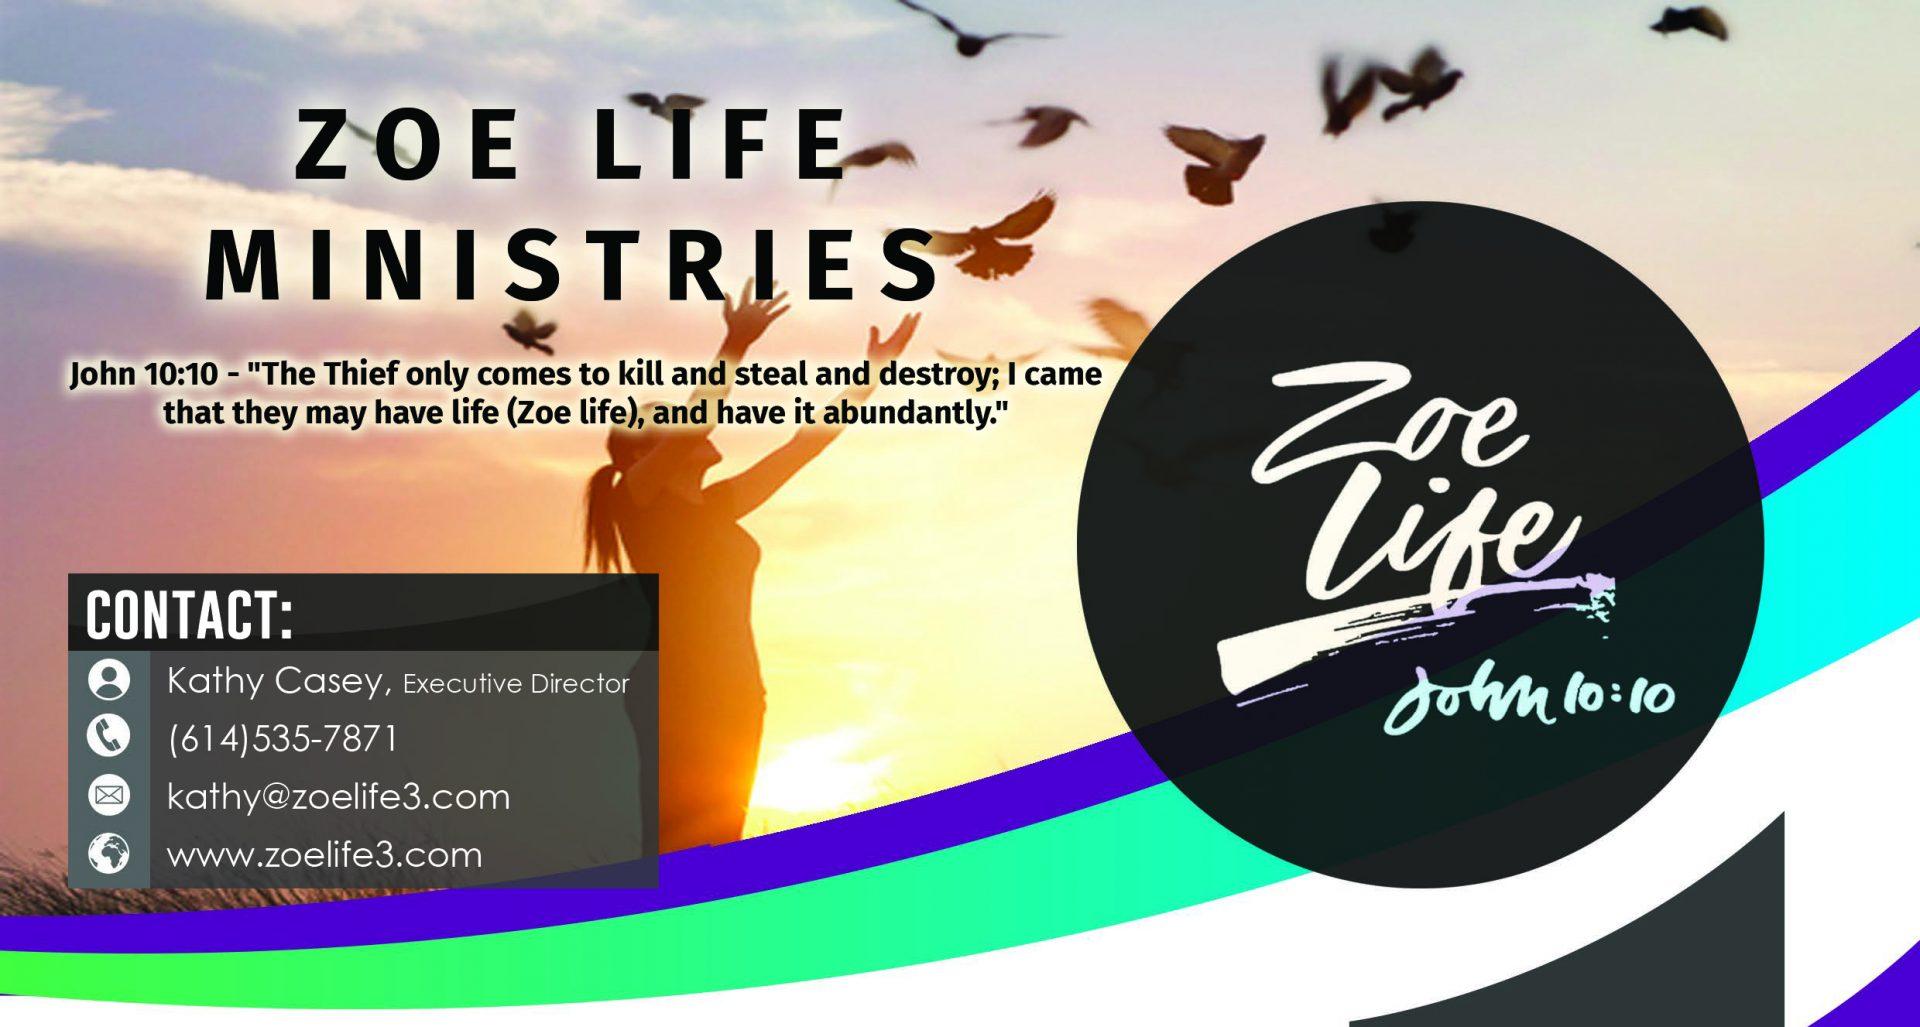 Zoe Life Ministries